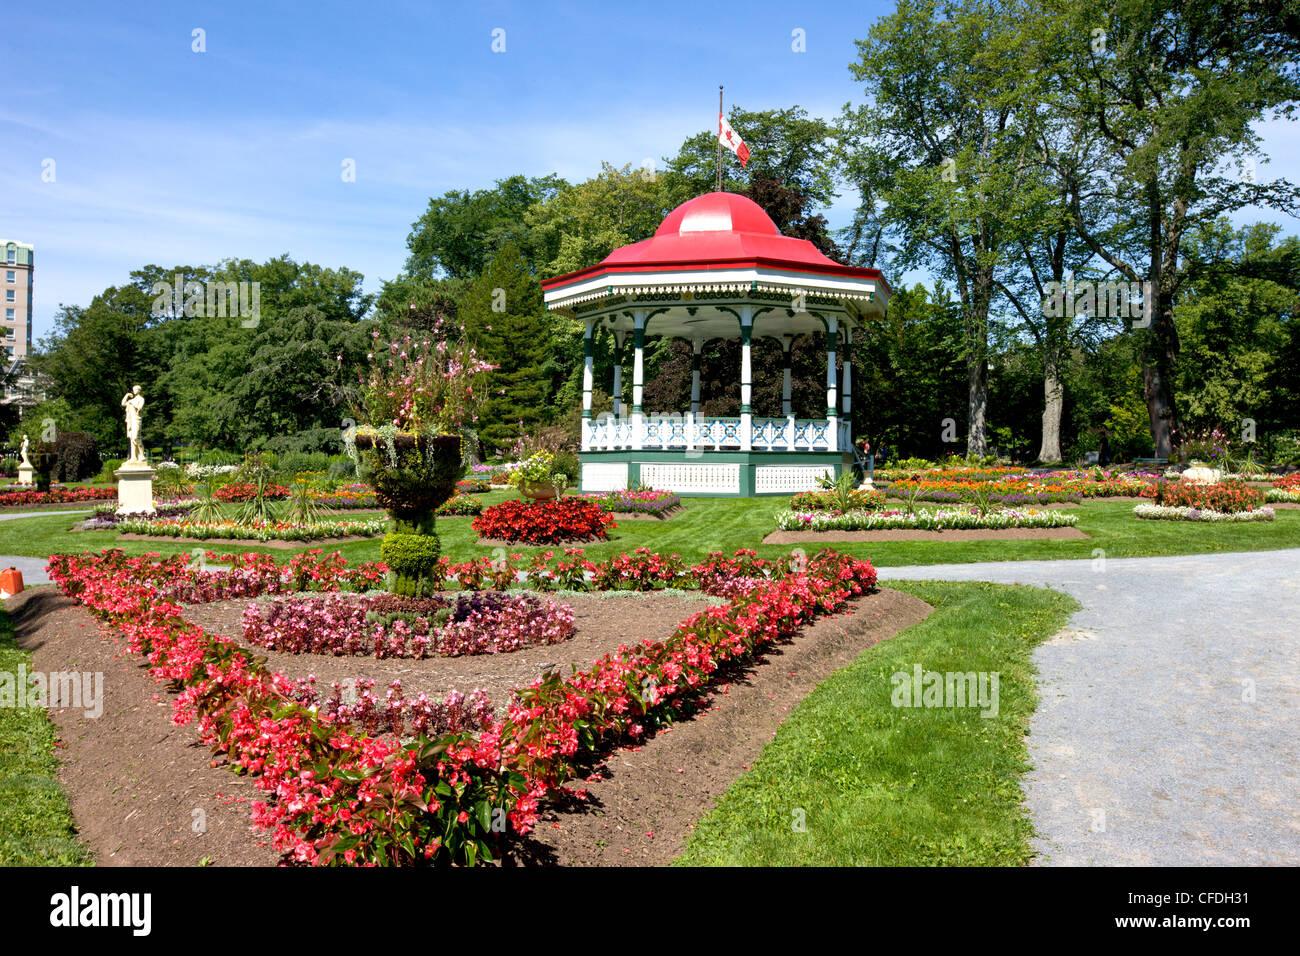 Merveilleux Gazebo, Halifax Public Gardens, Halifax, Nova Scotia, Canada ...